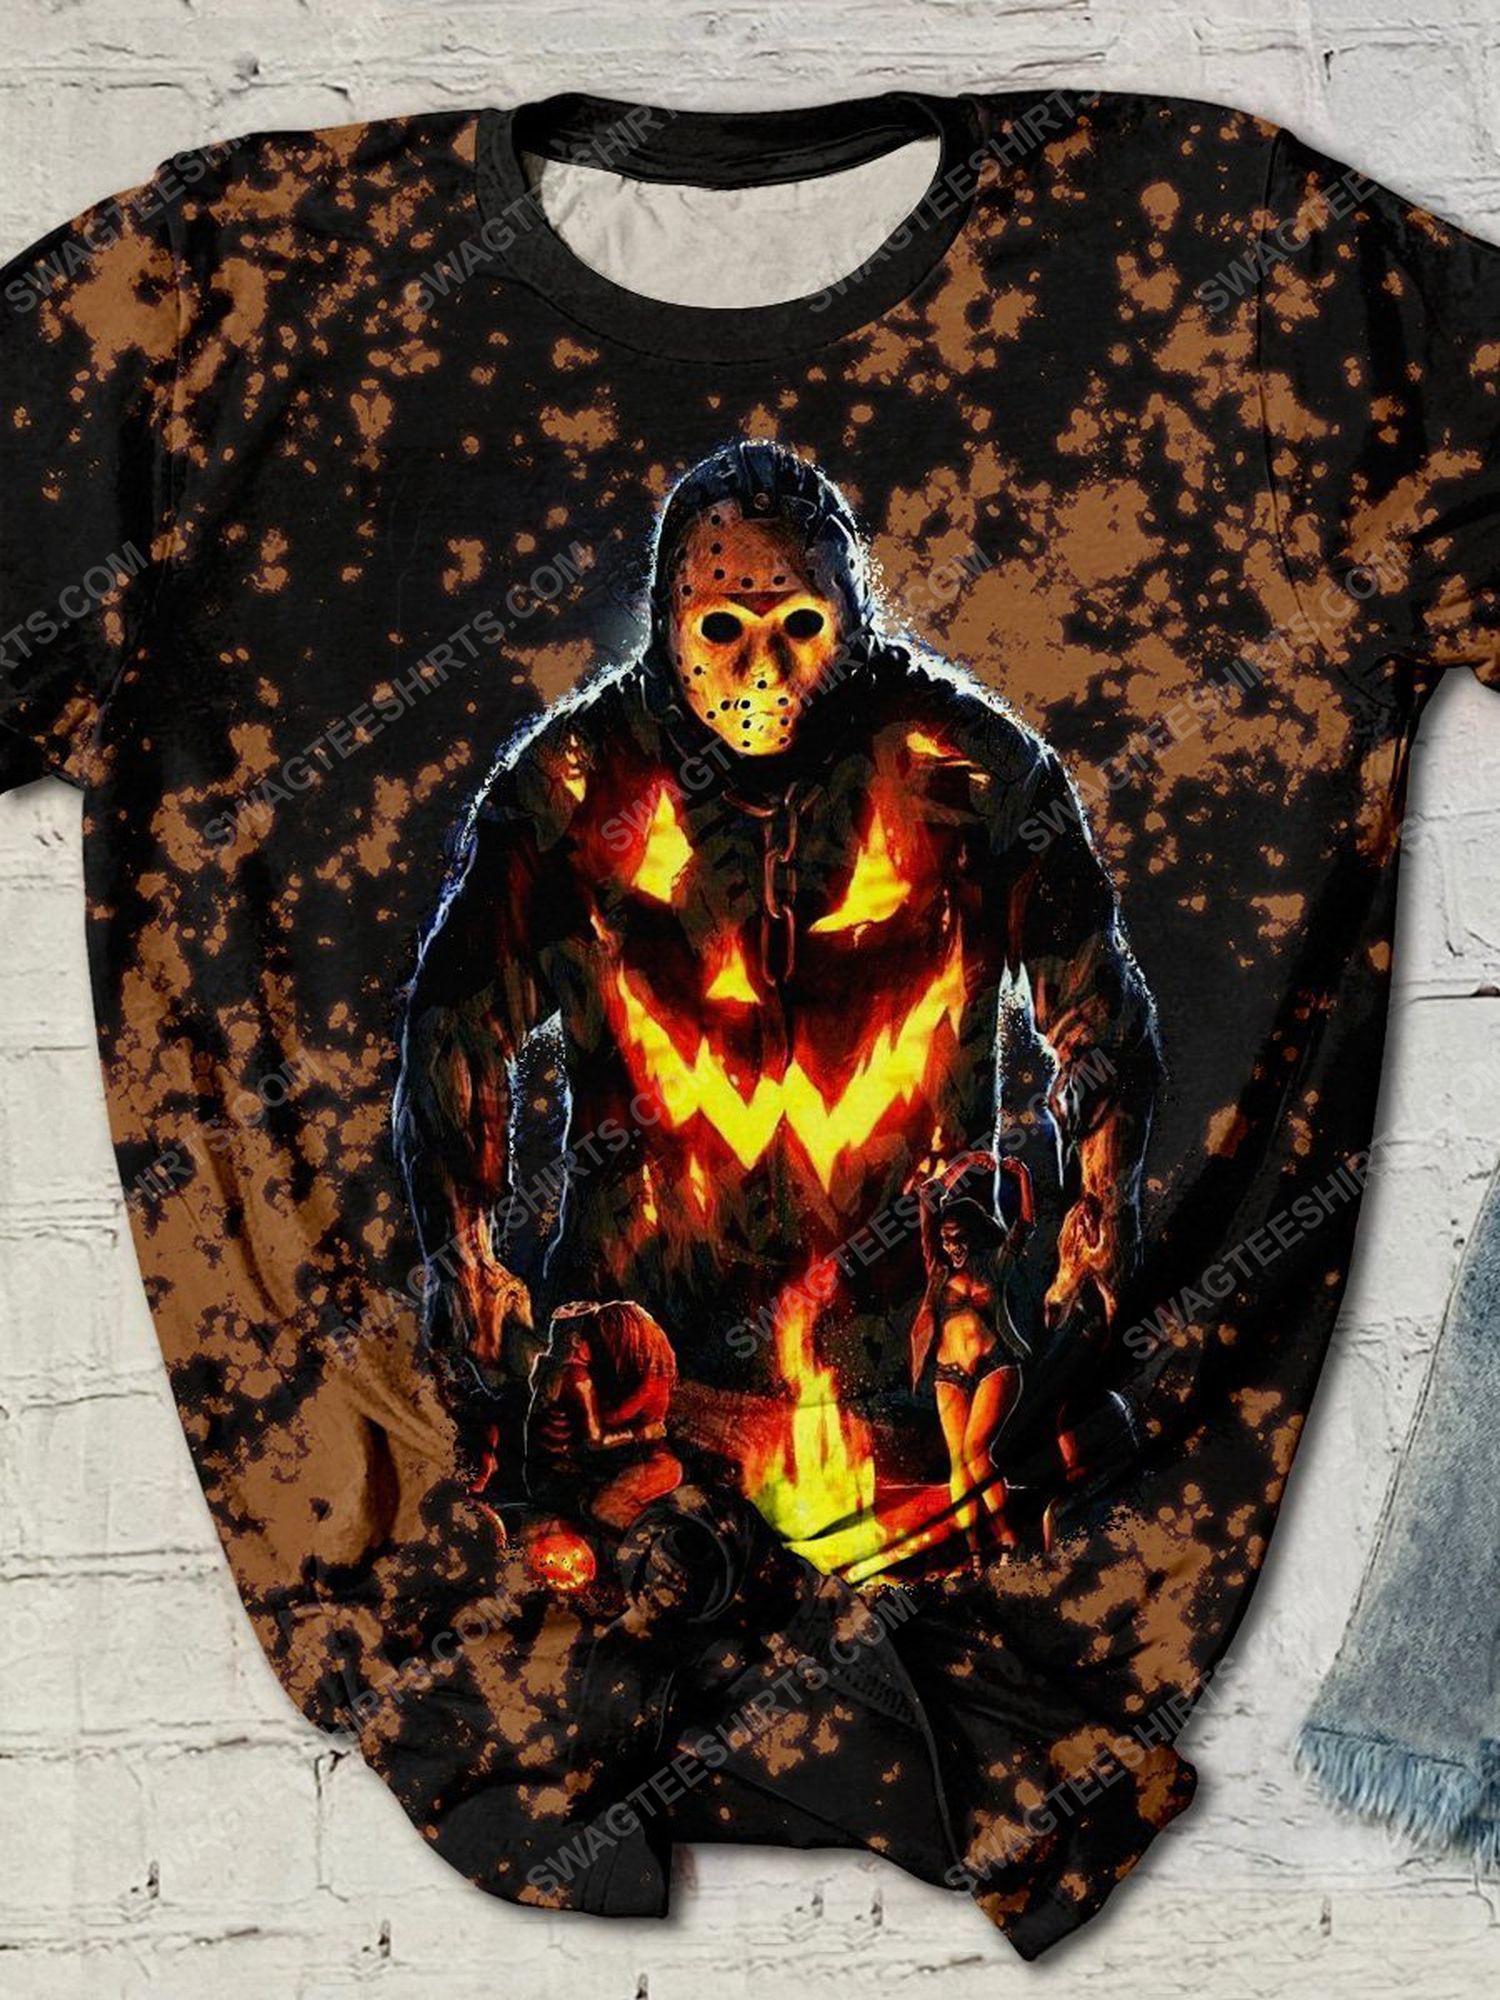 Halloween night jason voorhees friday the 13th shirt 1 - Copy